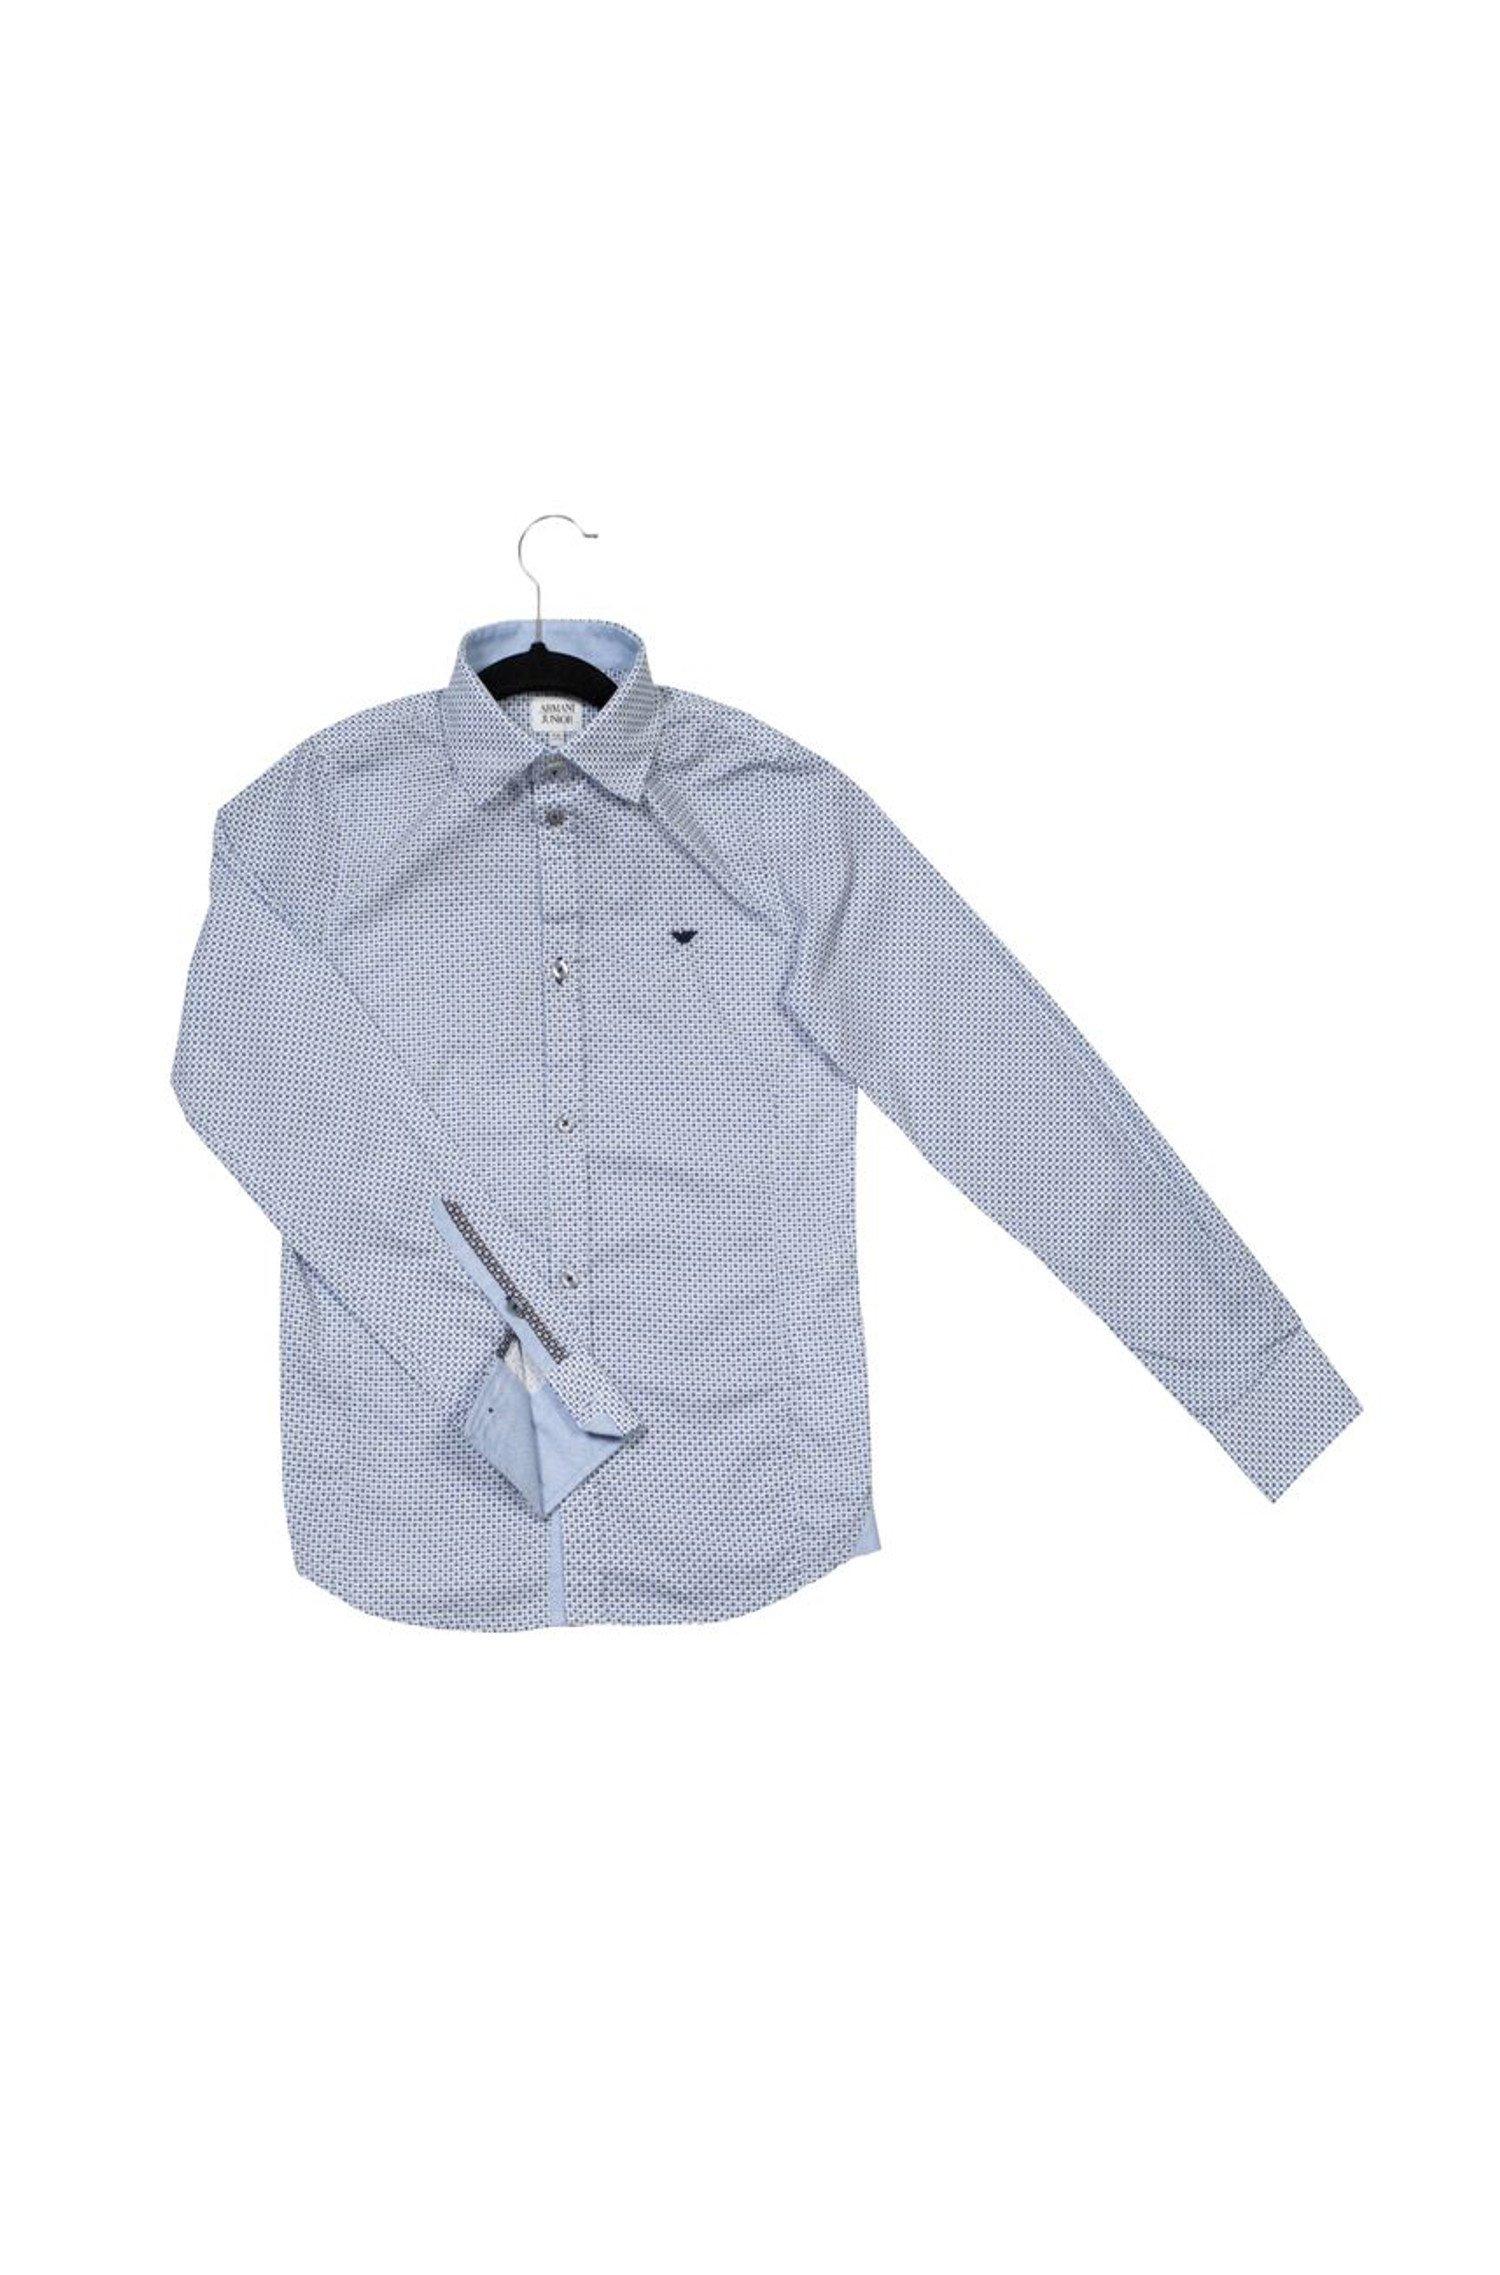 Armani Junior Boys' Dotted Pattern Button Down Shirt w/Dark Collar Contrast (Big Kids), 14 by Armani Junior (Image #1)